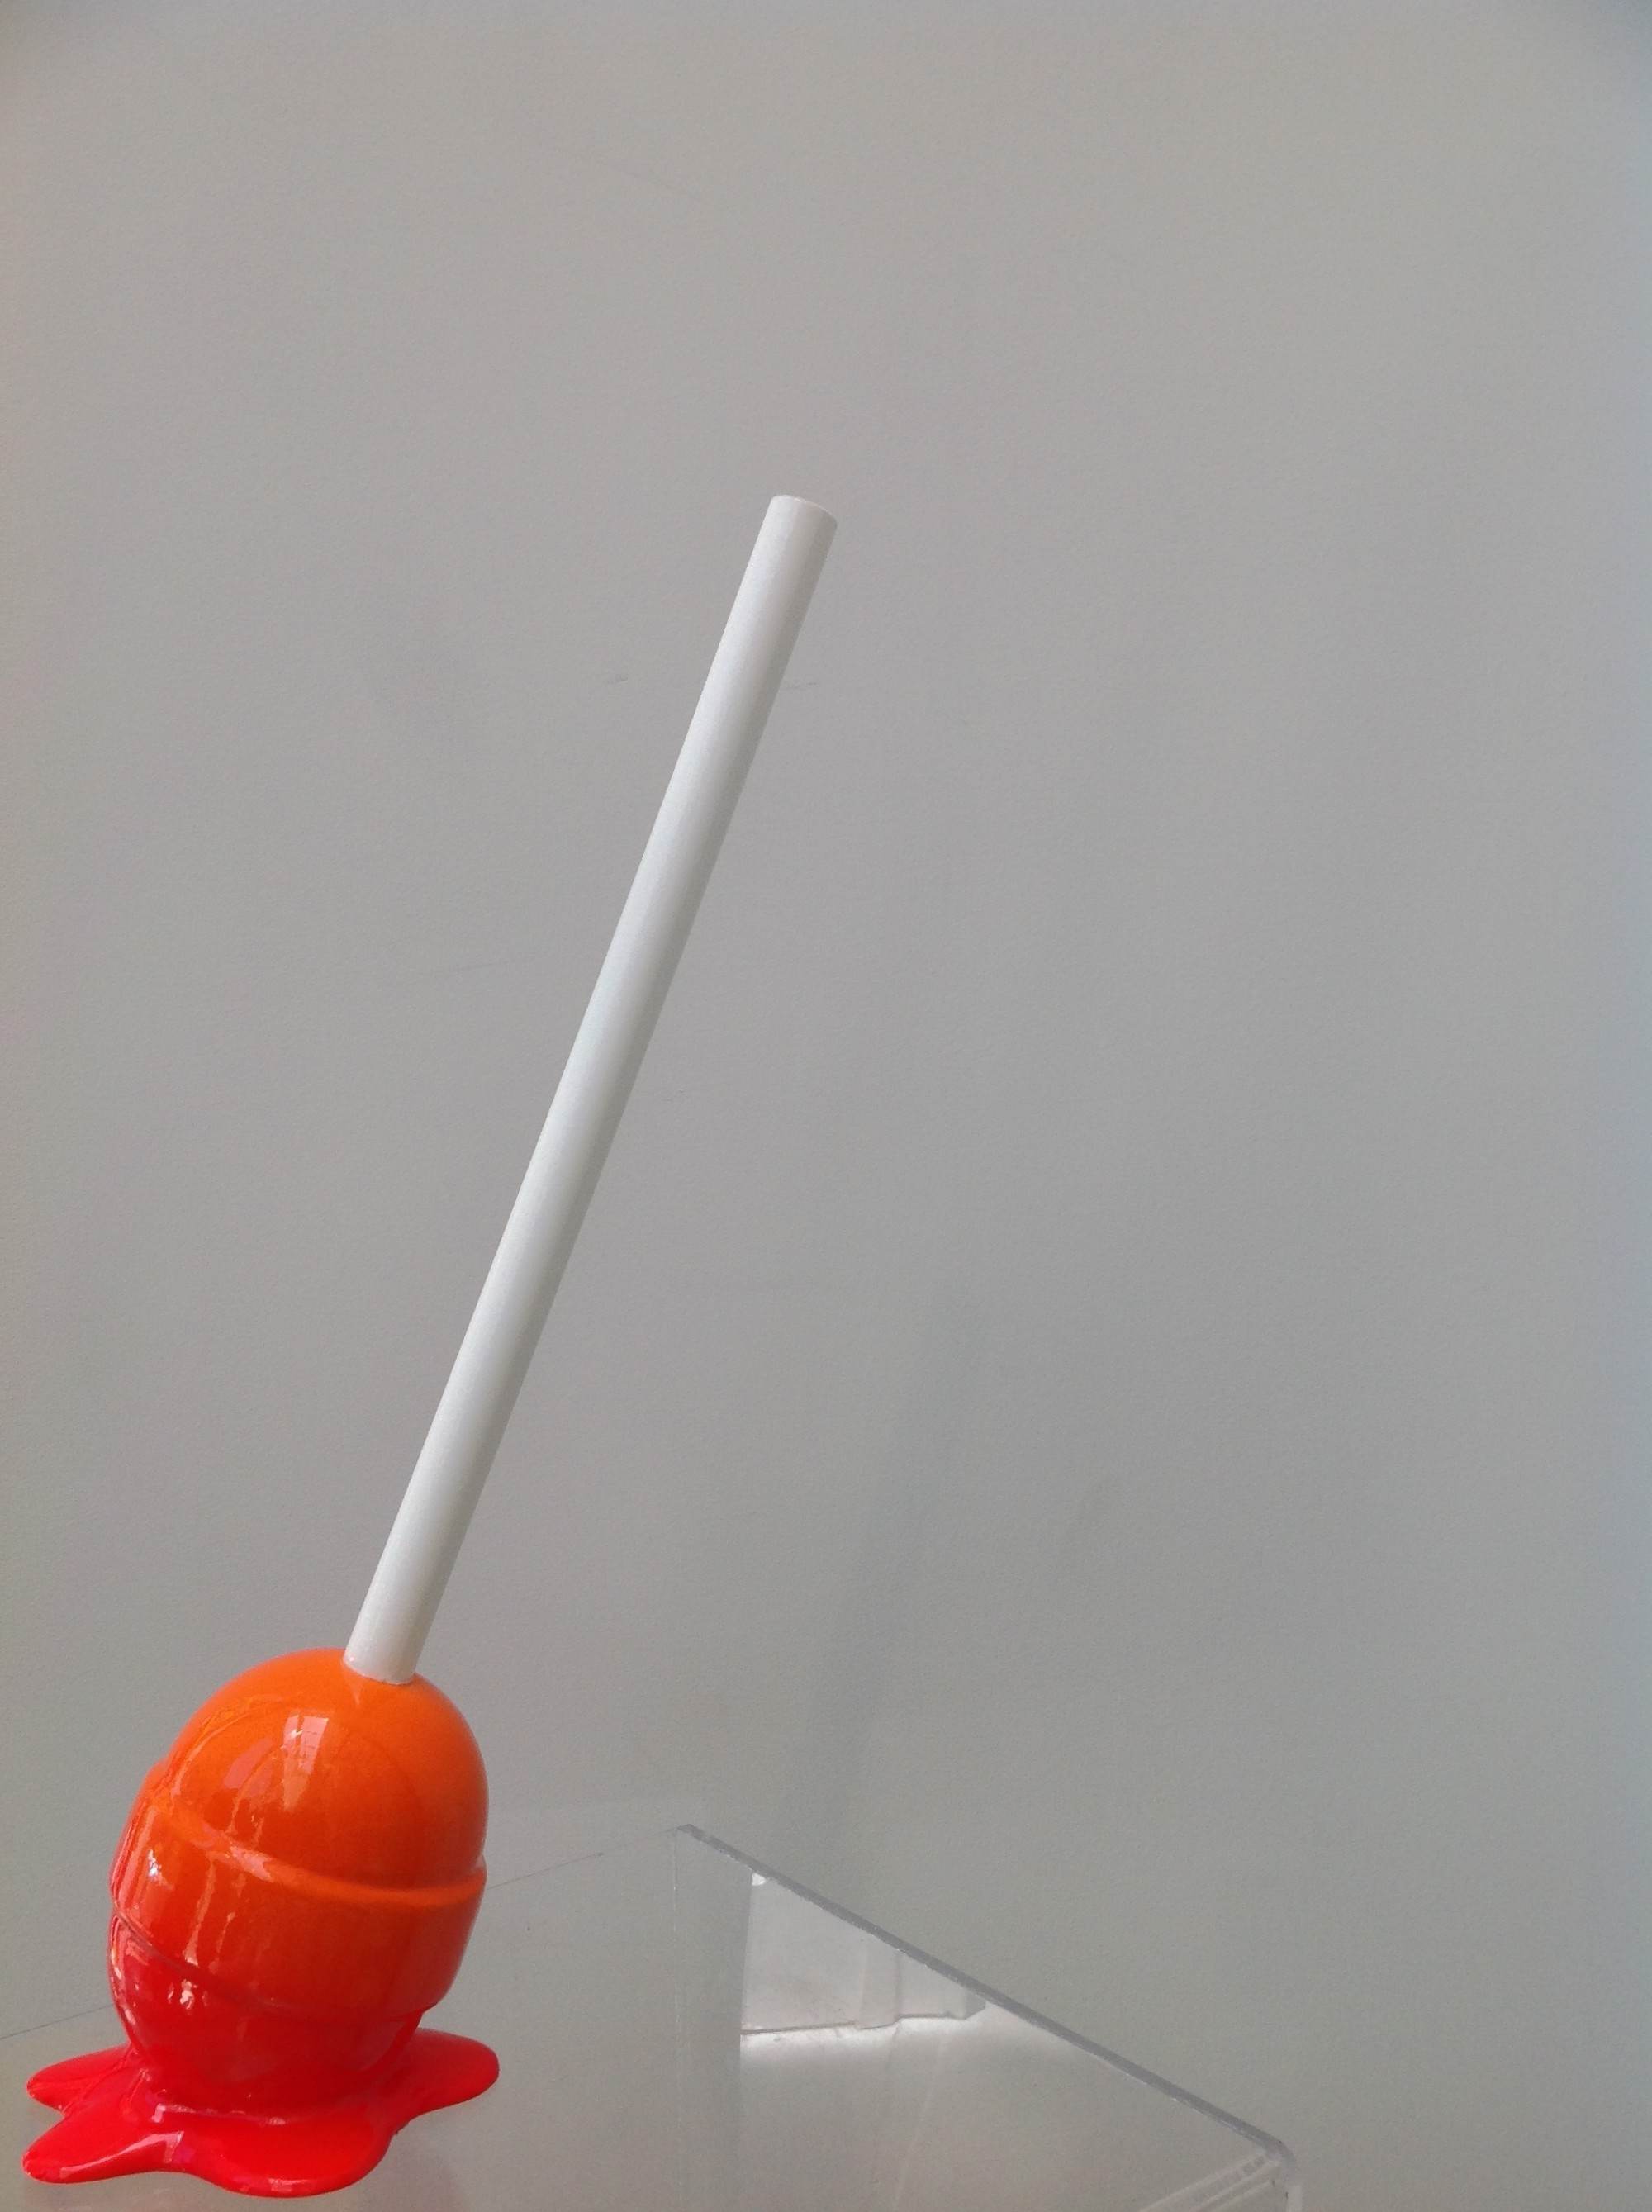 The Sweet Life small Red/Orange Ombre Lollipop by Elena Bulatova